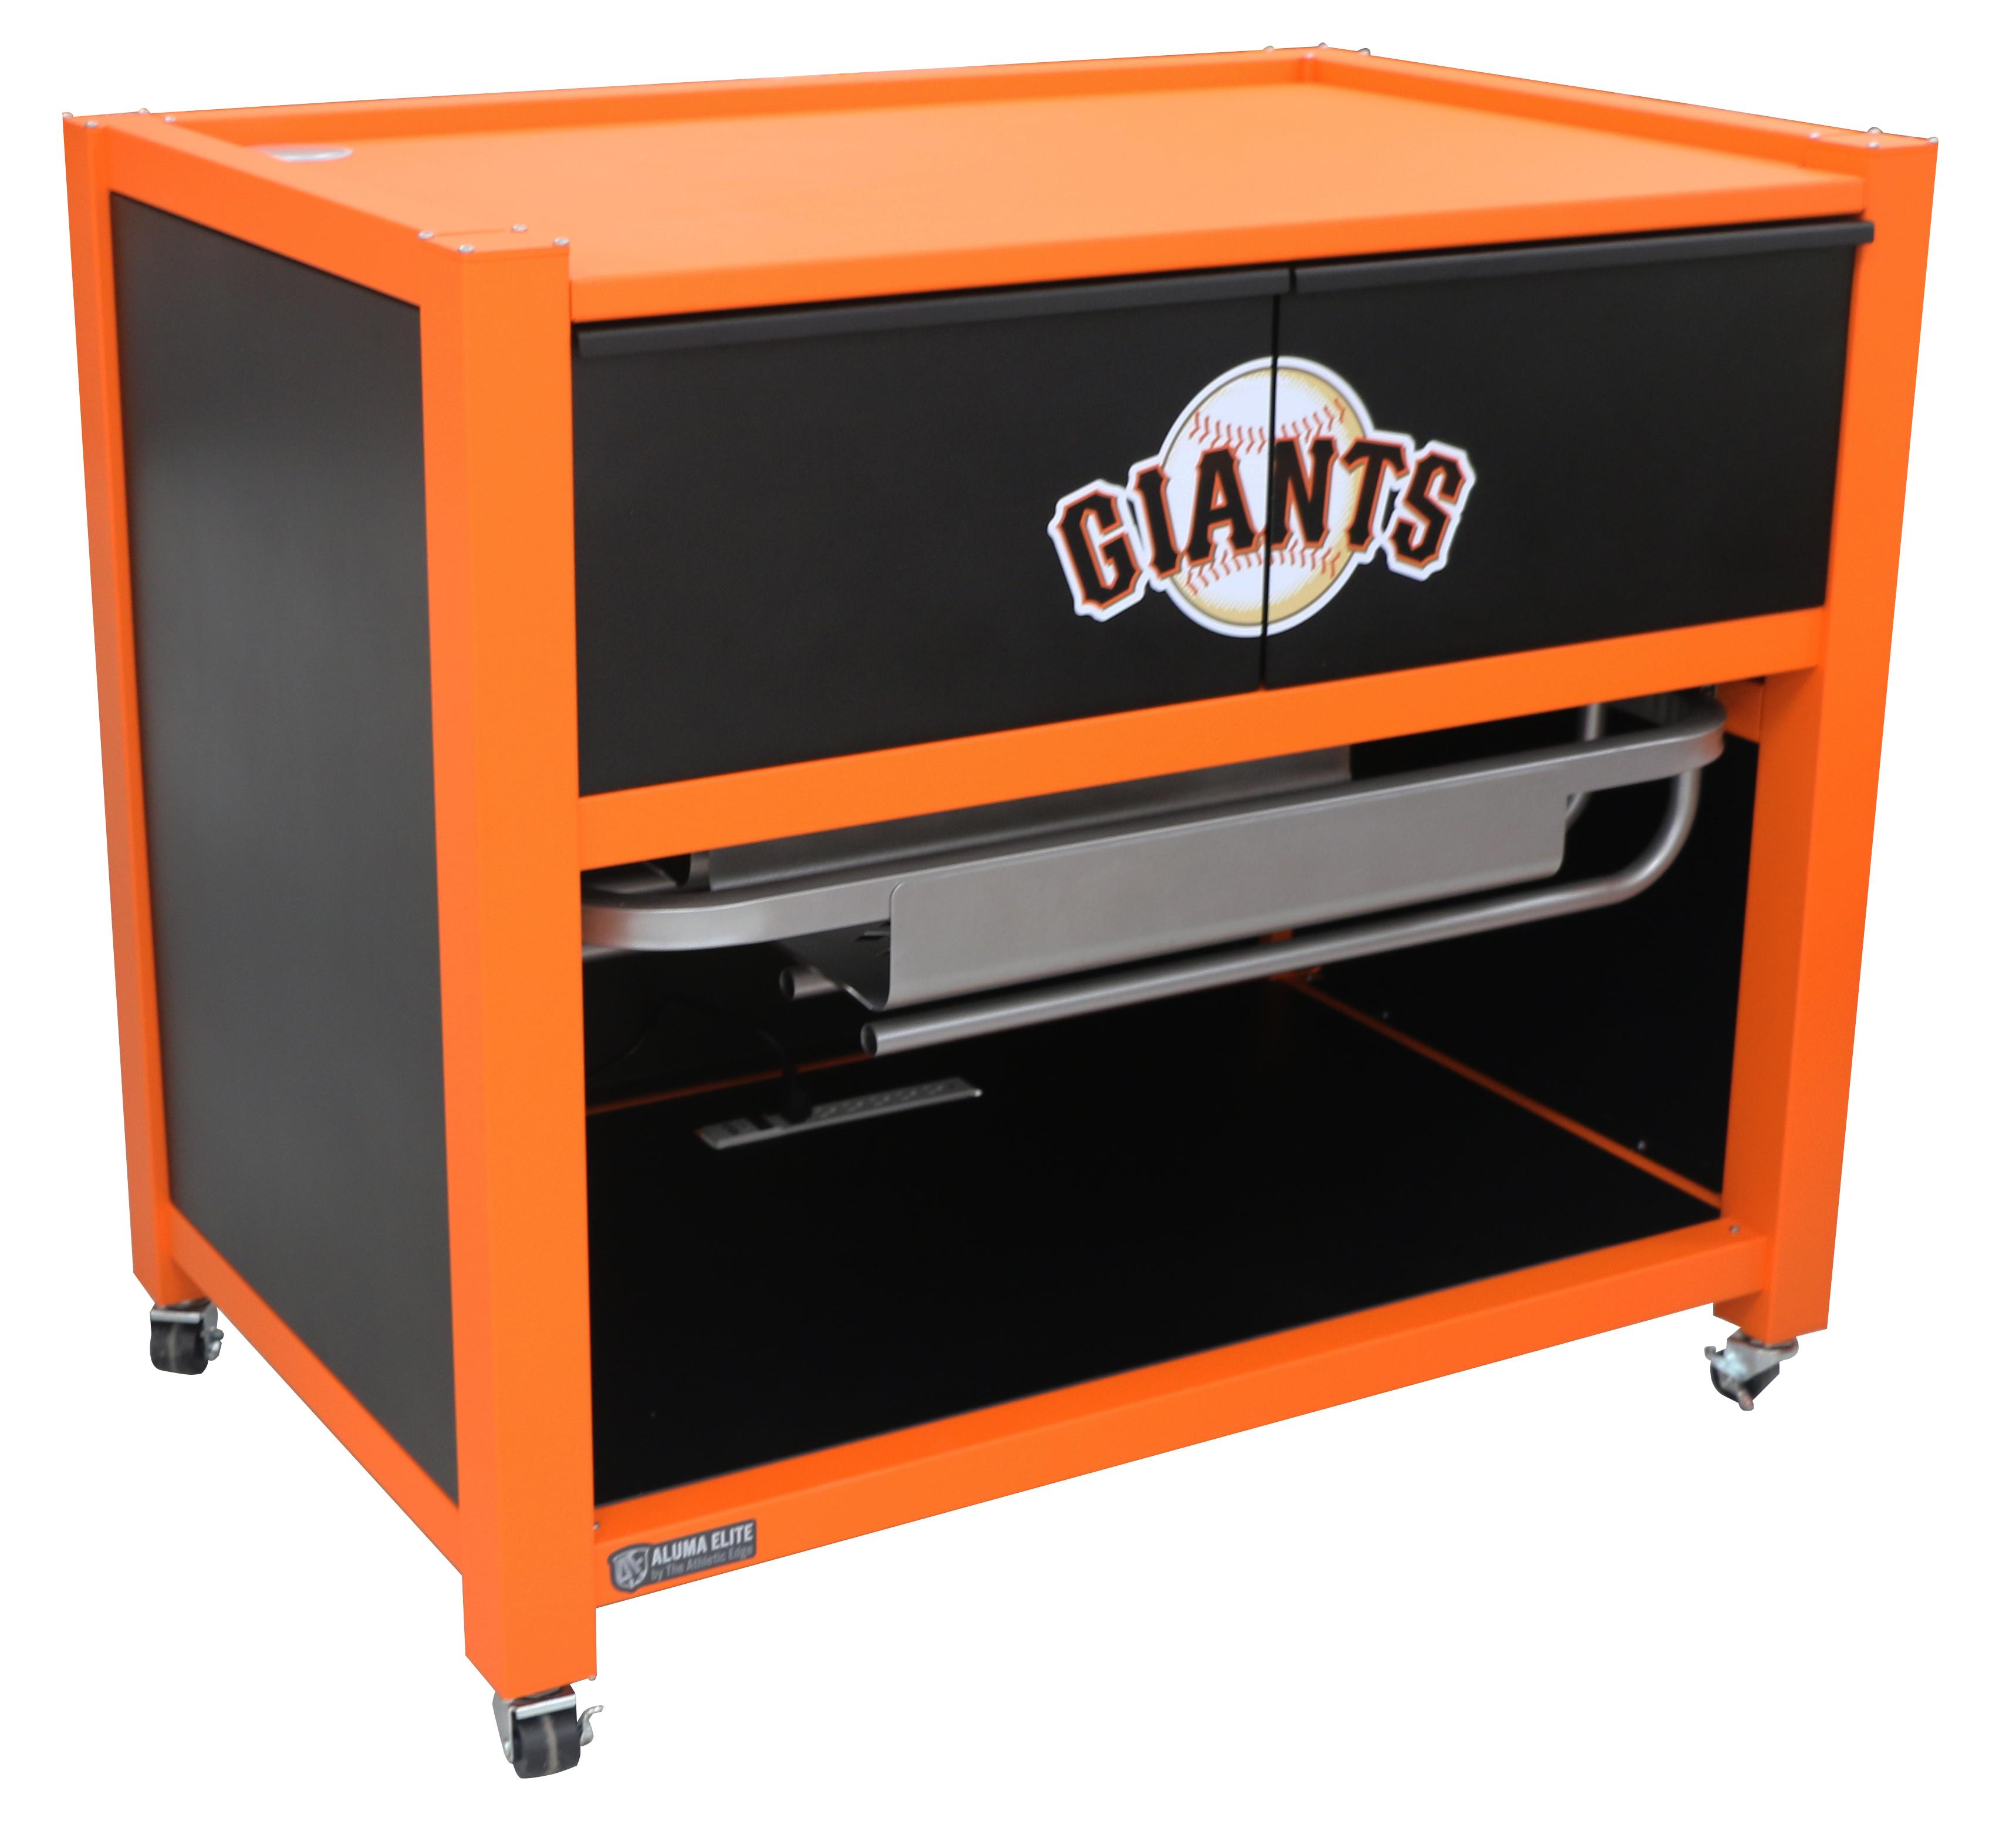 San Francisco Giants-(XL Modality Cart)